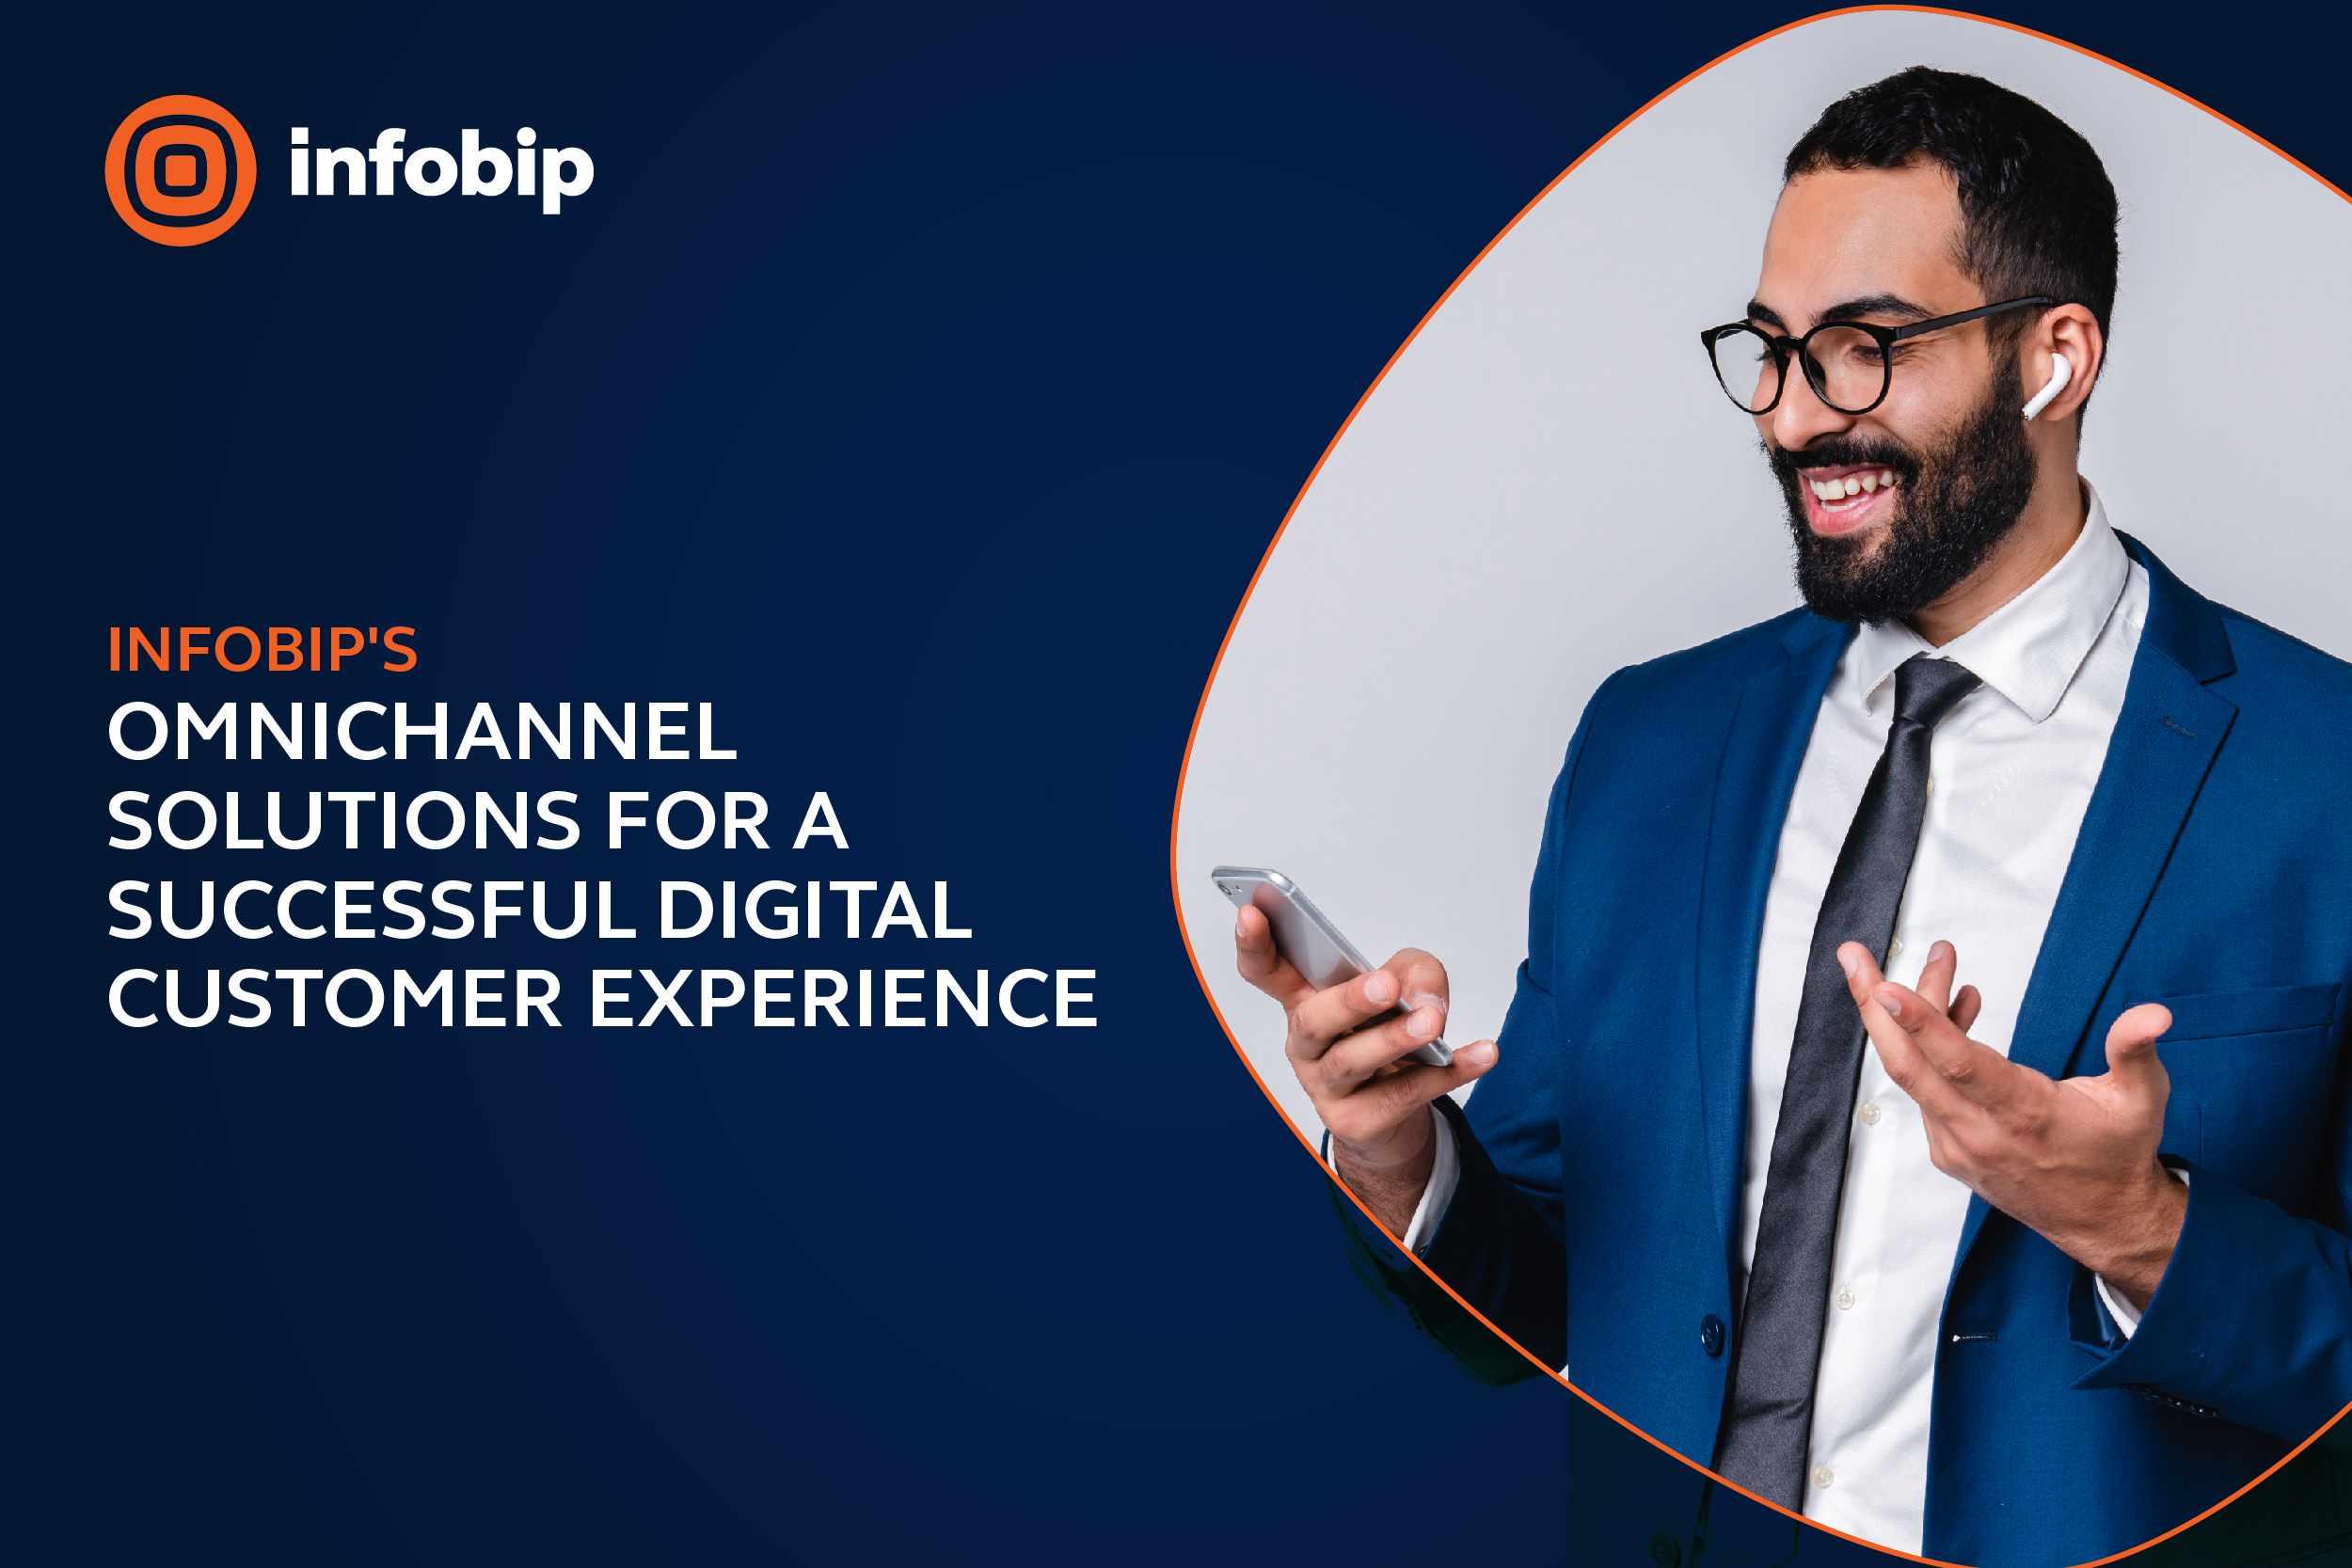 customer digital infobip omnichannel solutions